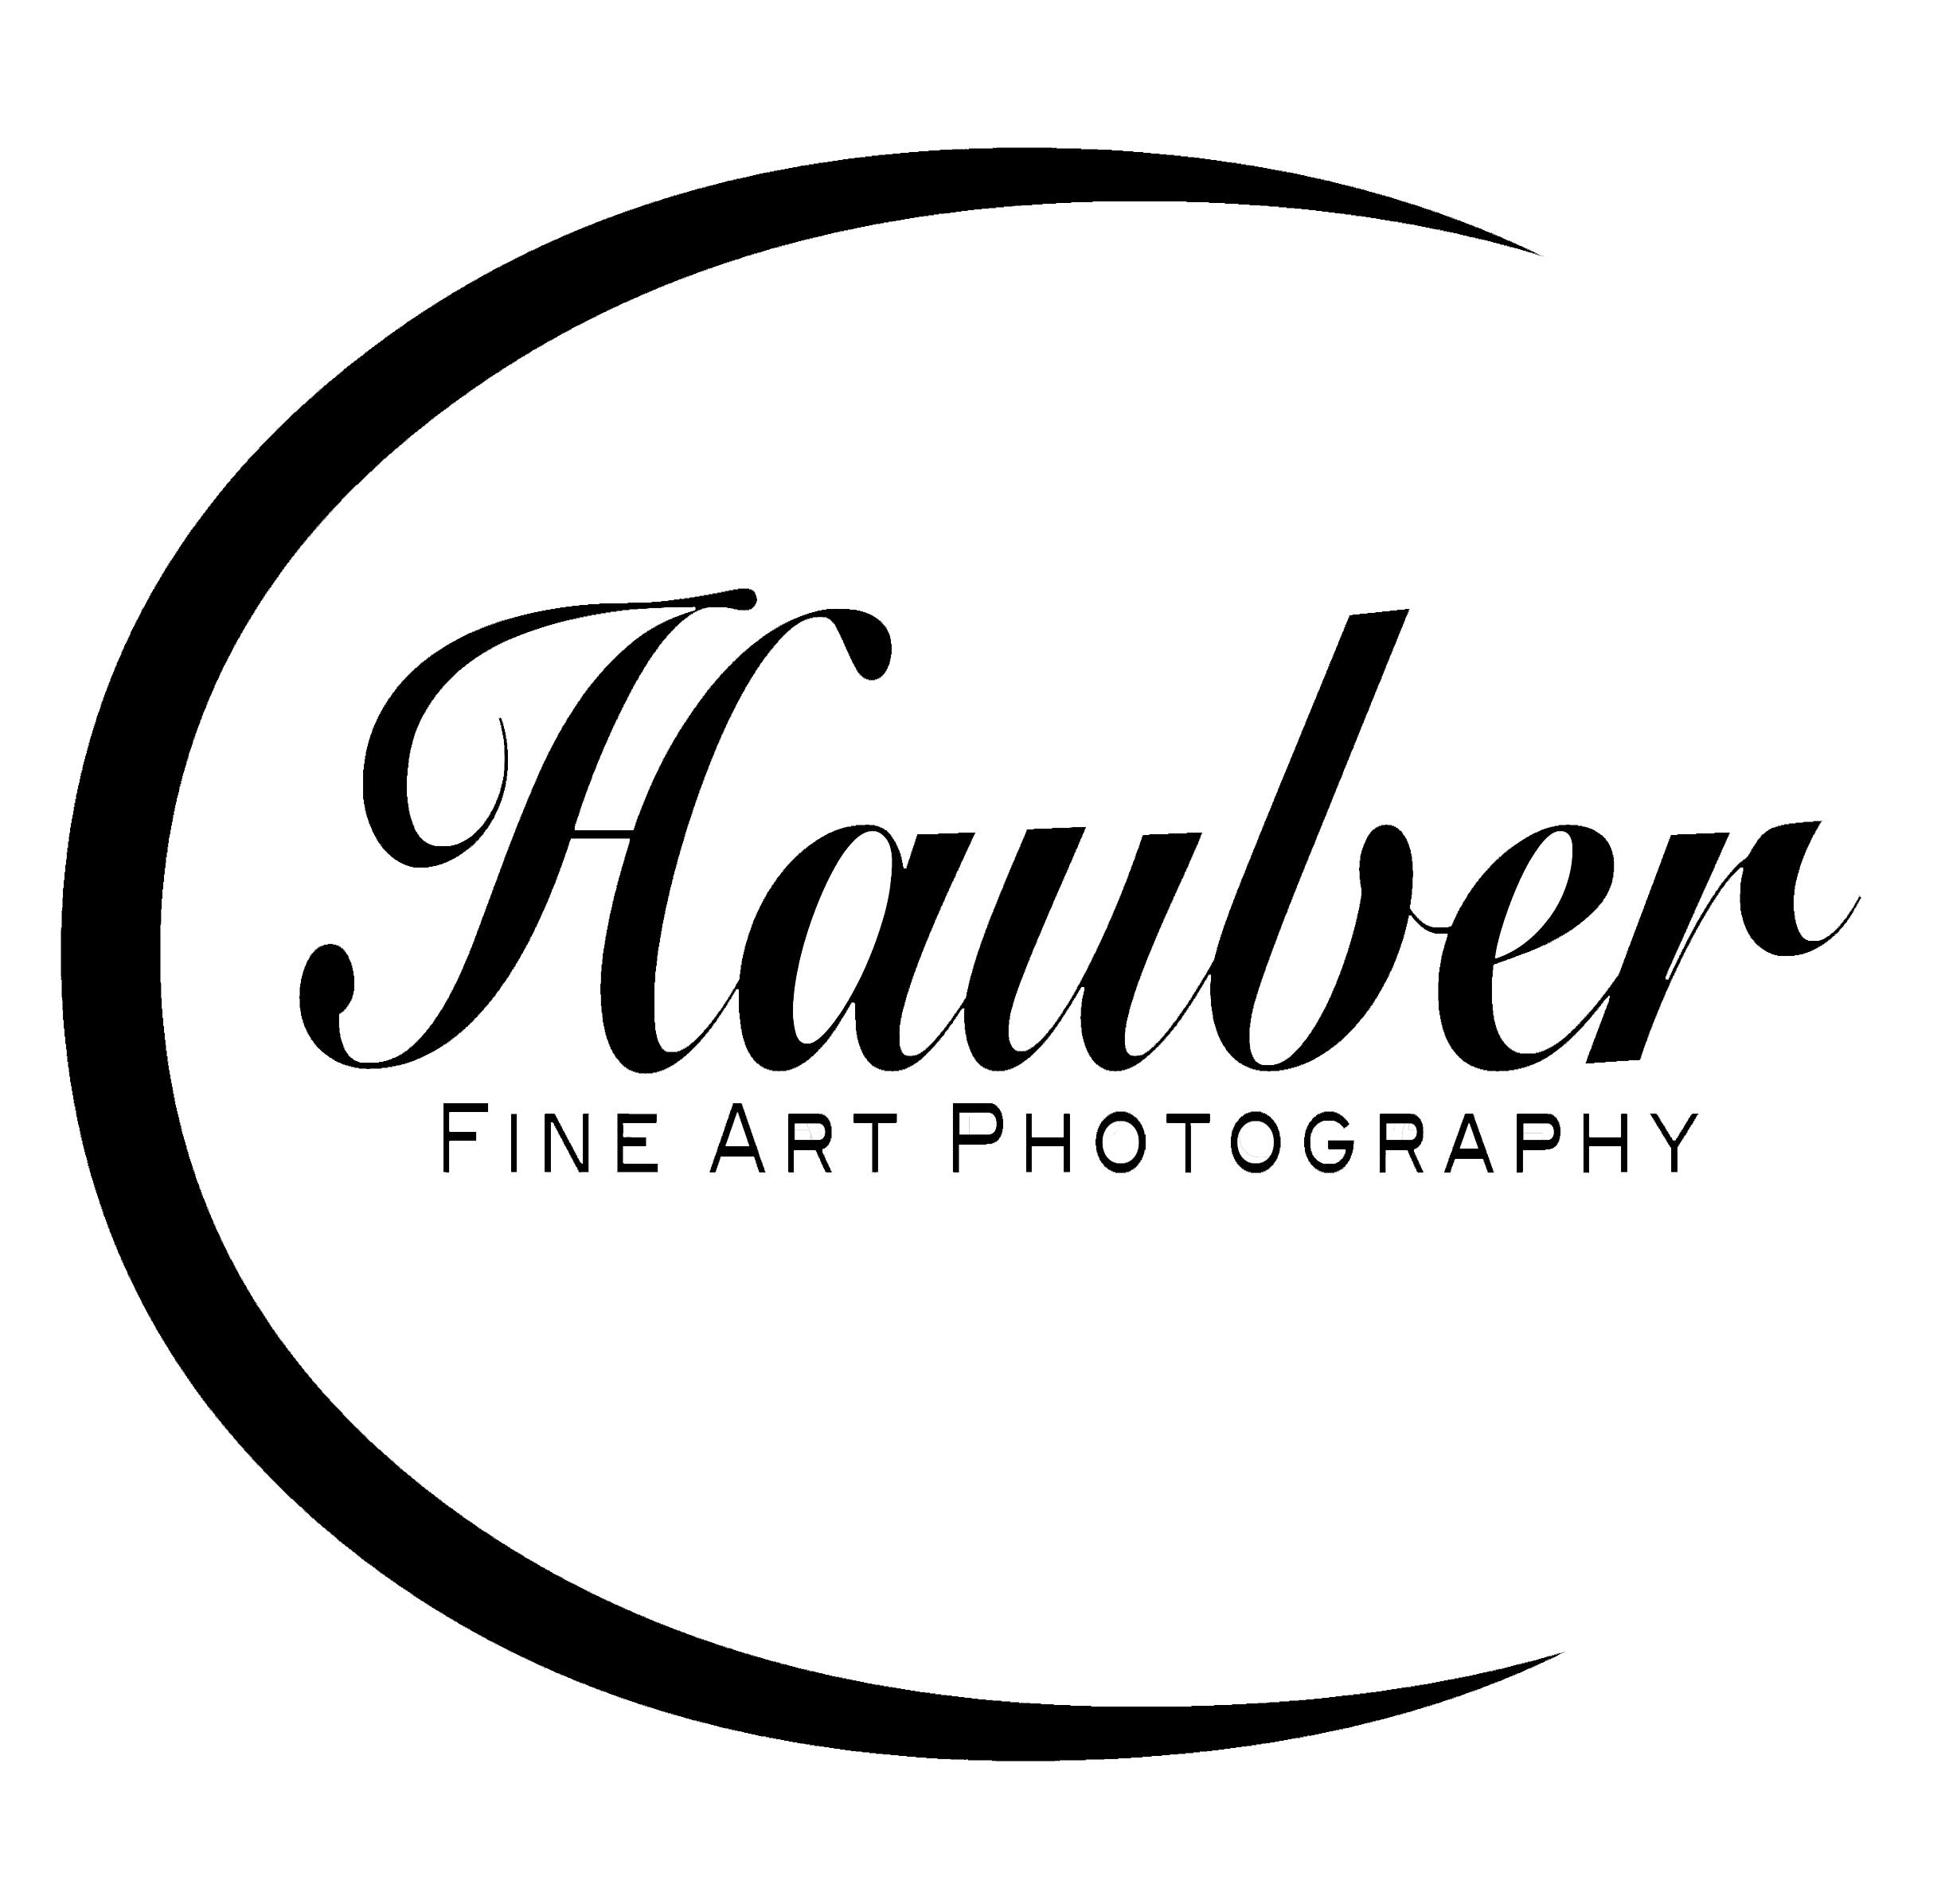 Christine Hauber Photography